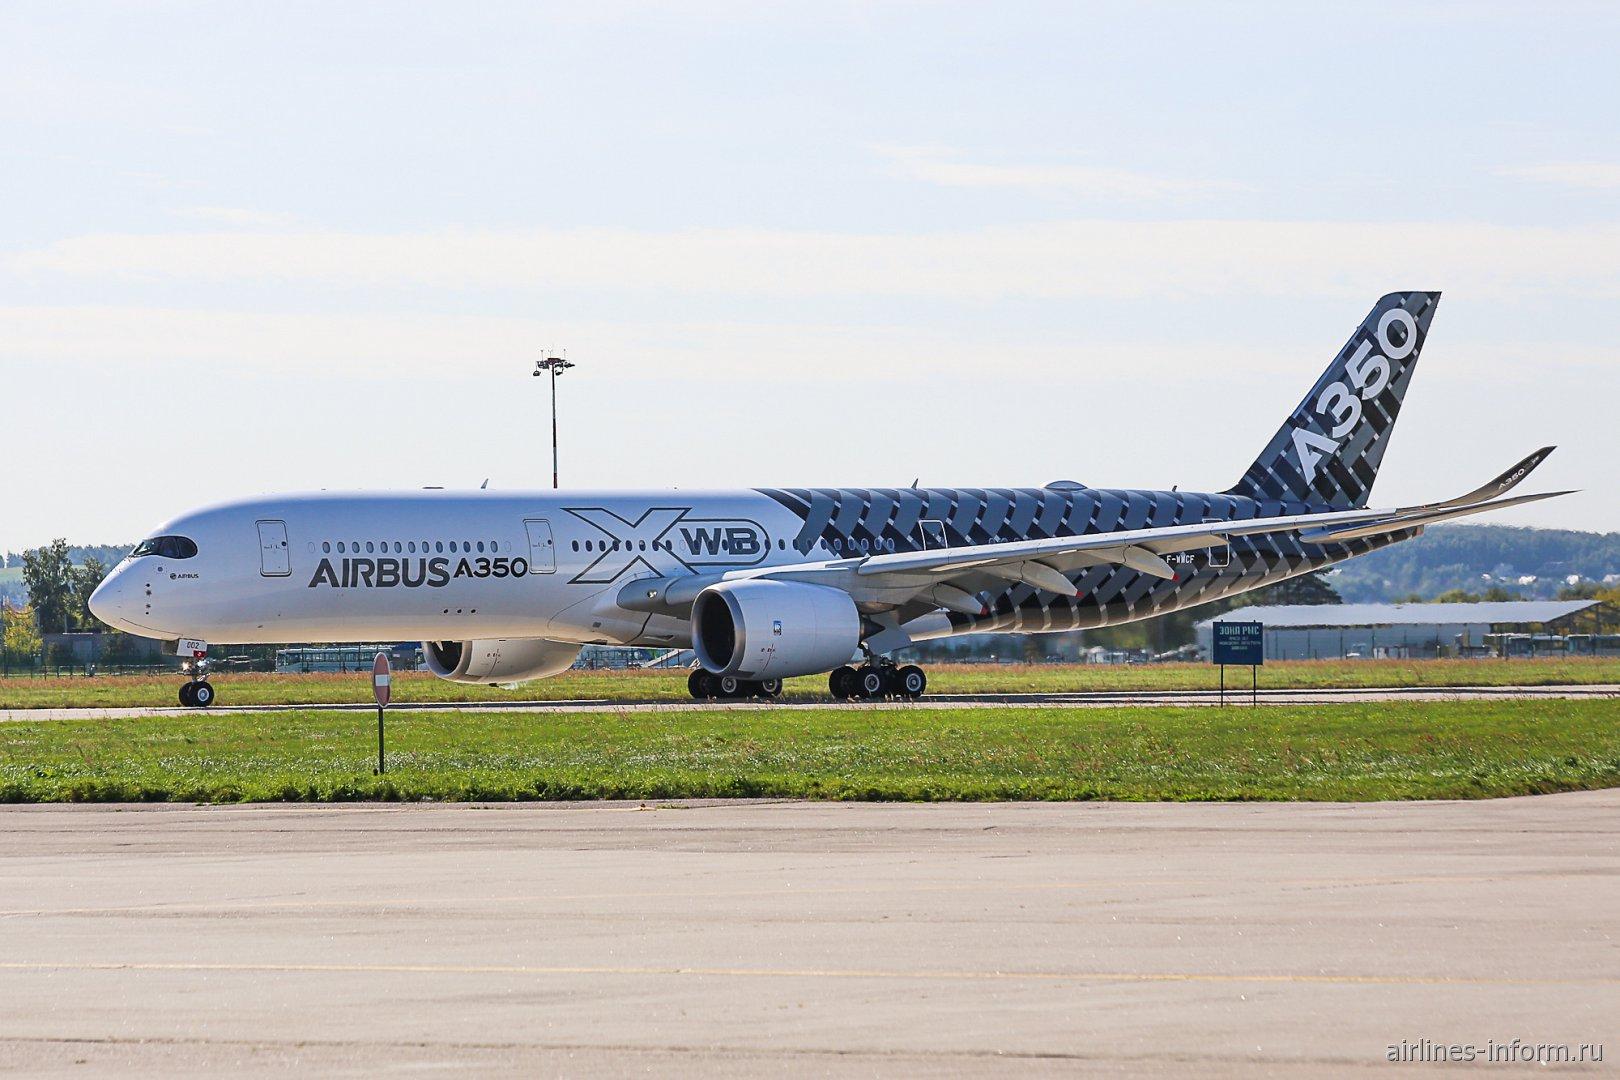 Airbus A350-900 F-WWCF в аэропорту Жуковский